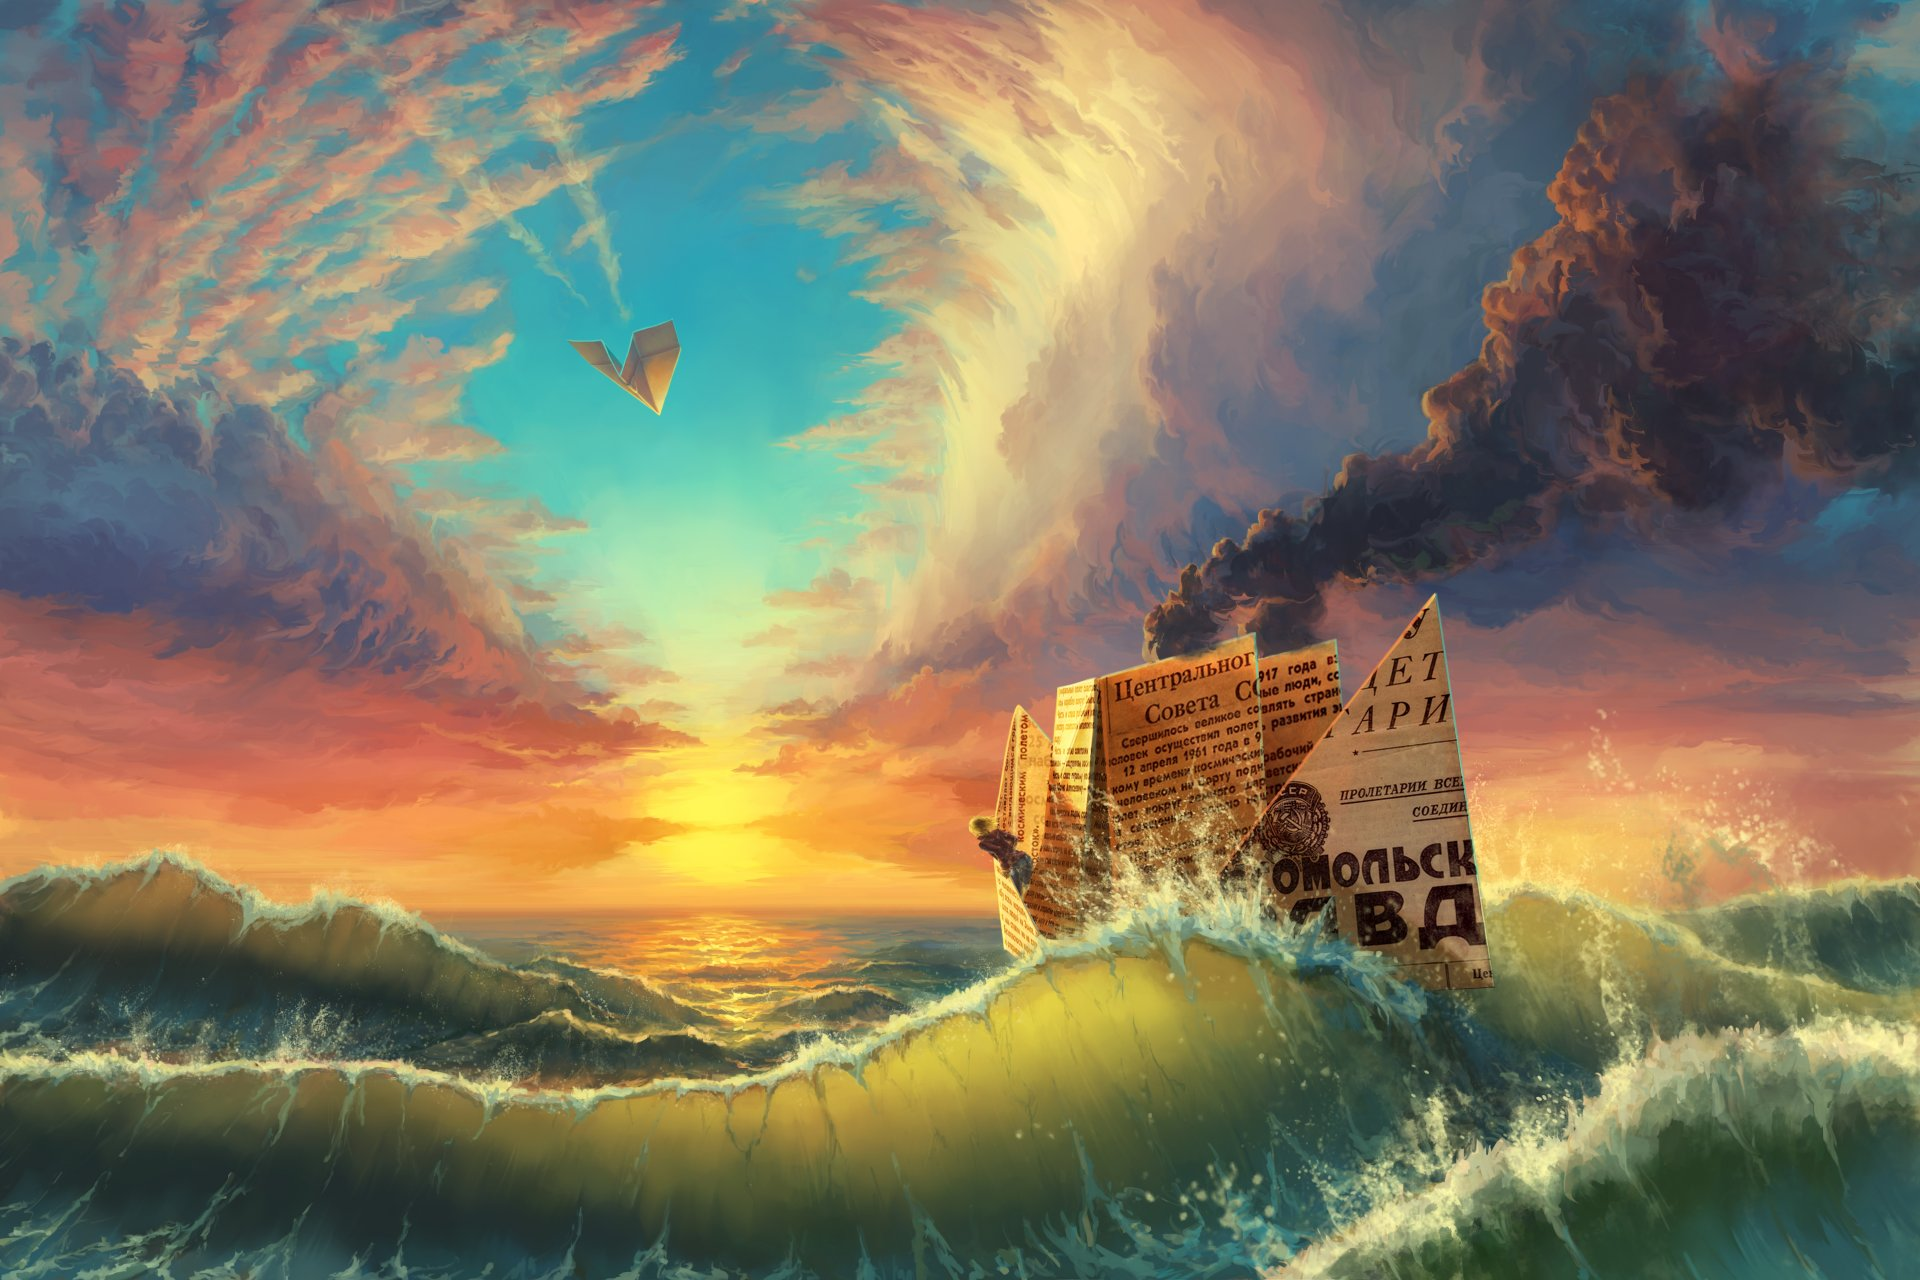 картинки фэнтези небо и корабль под